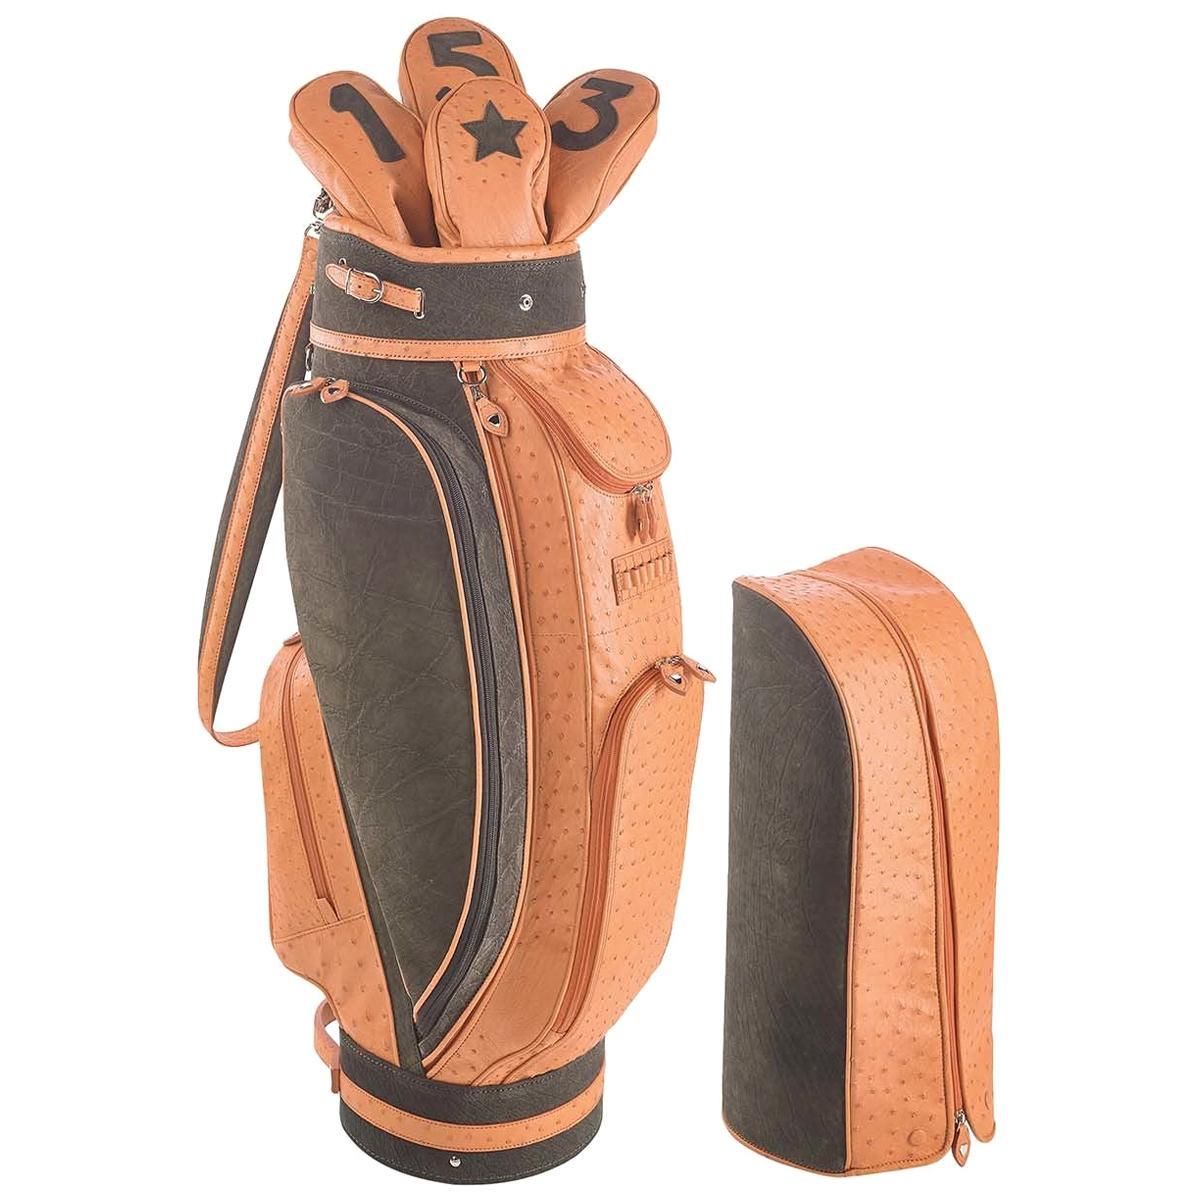 Royal Apricot Golf Bag by Barchi